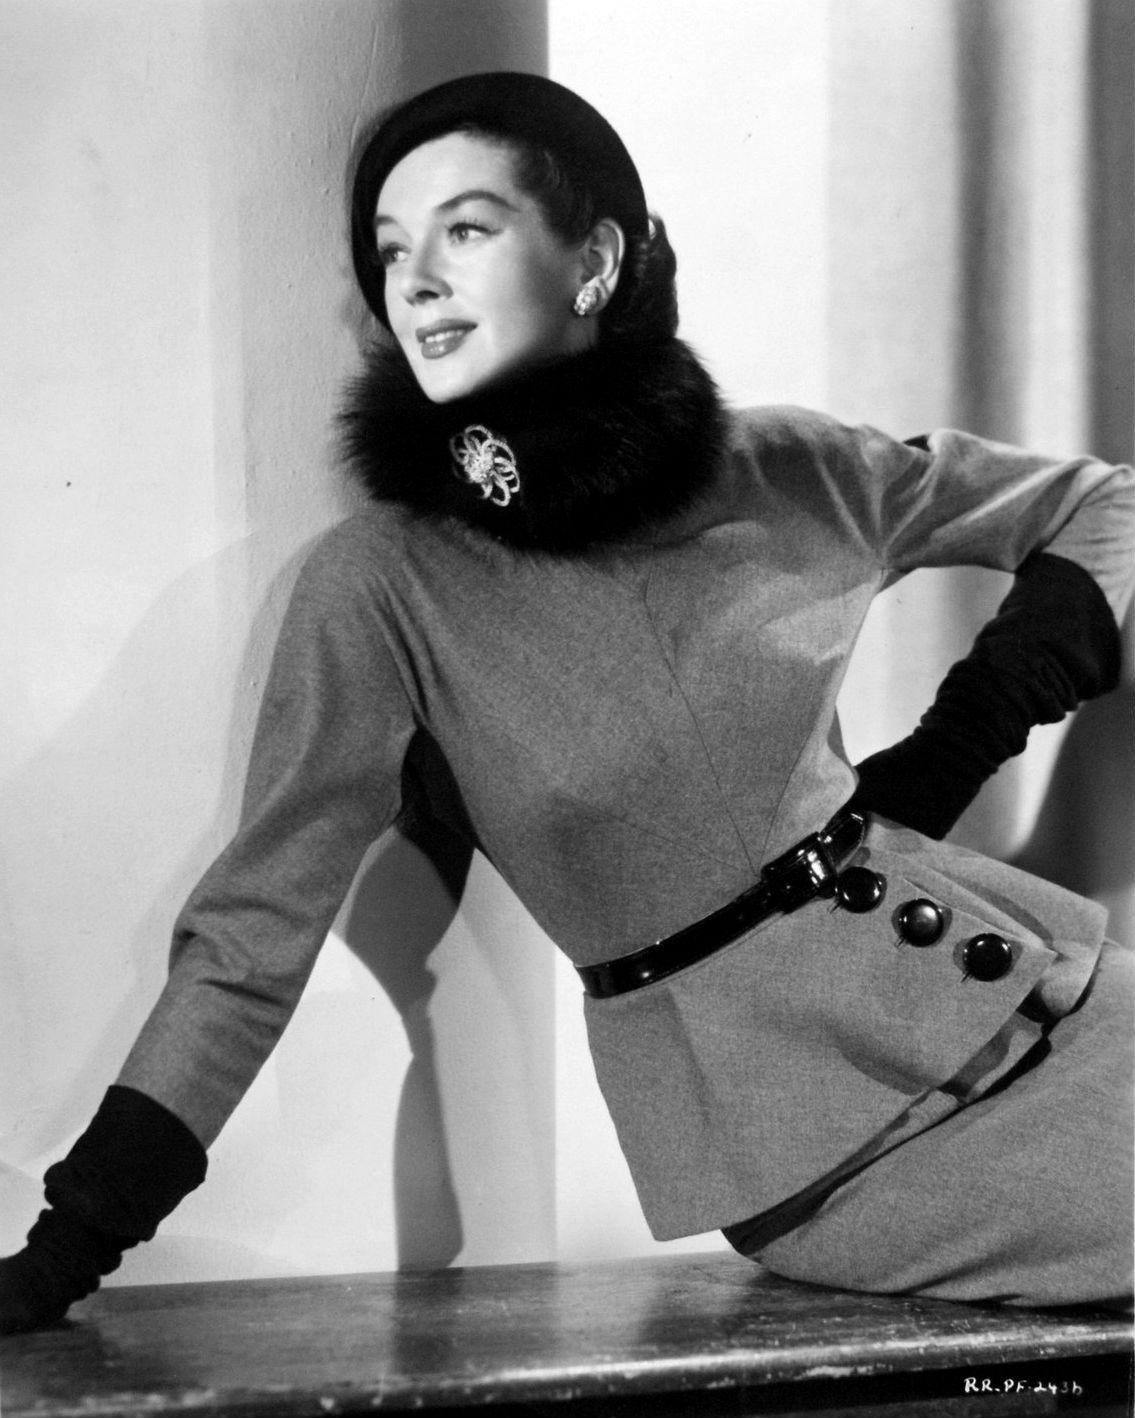 Rosalind Russell 1953 Fifties Fashion Fashion 50s Fashion